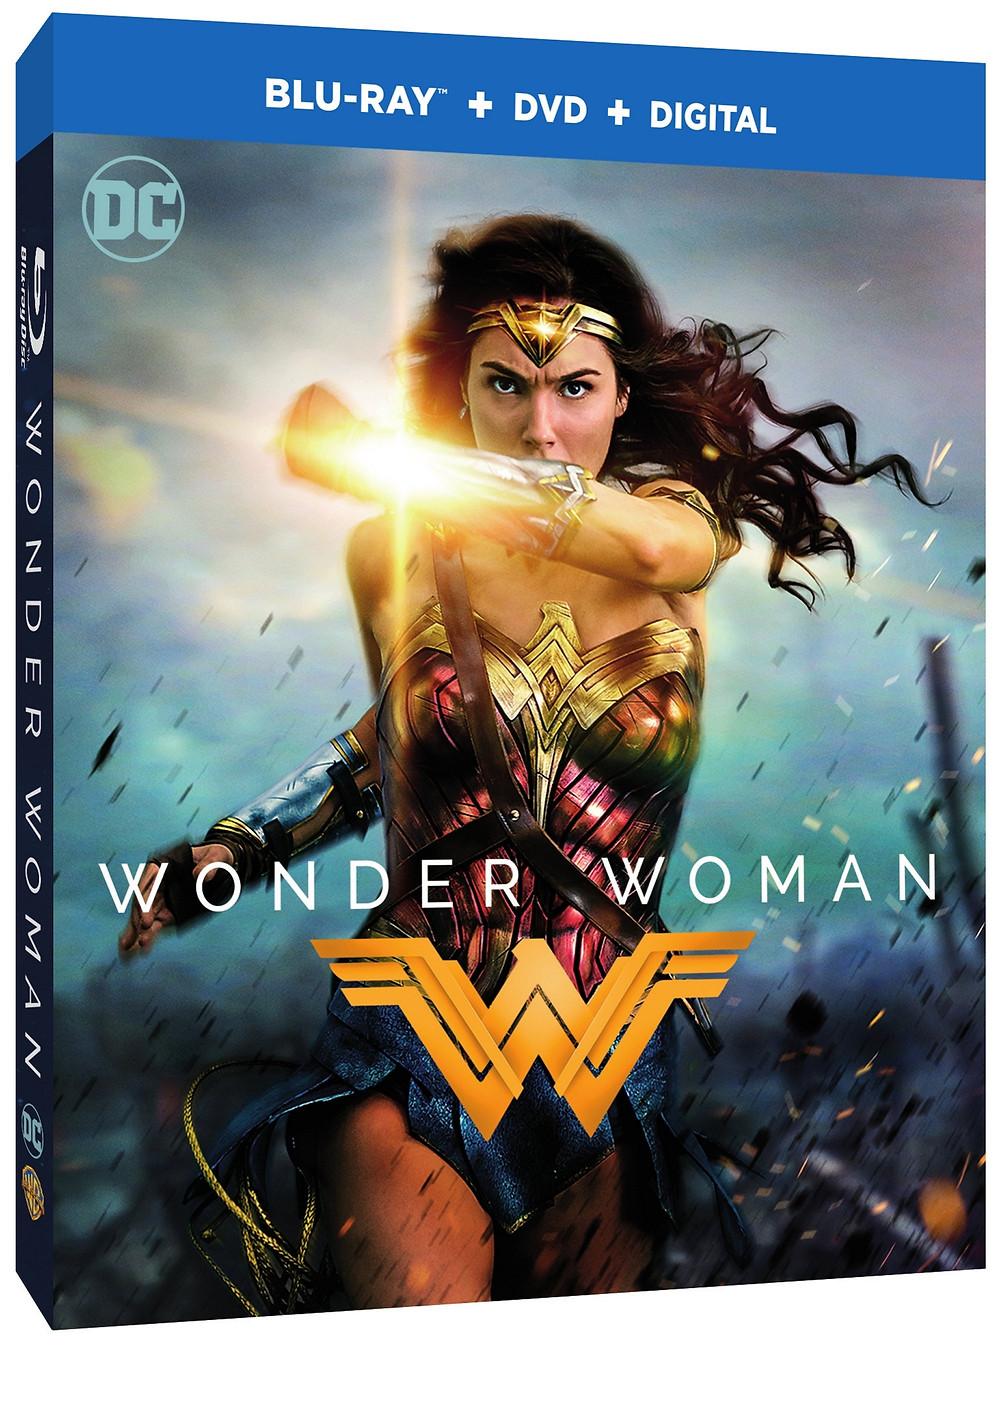 Wonder Woman box art